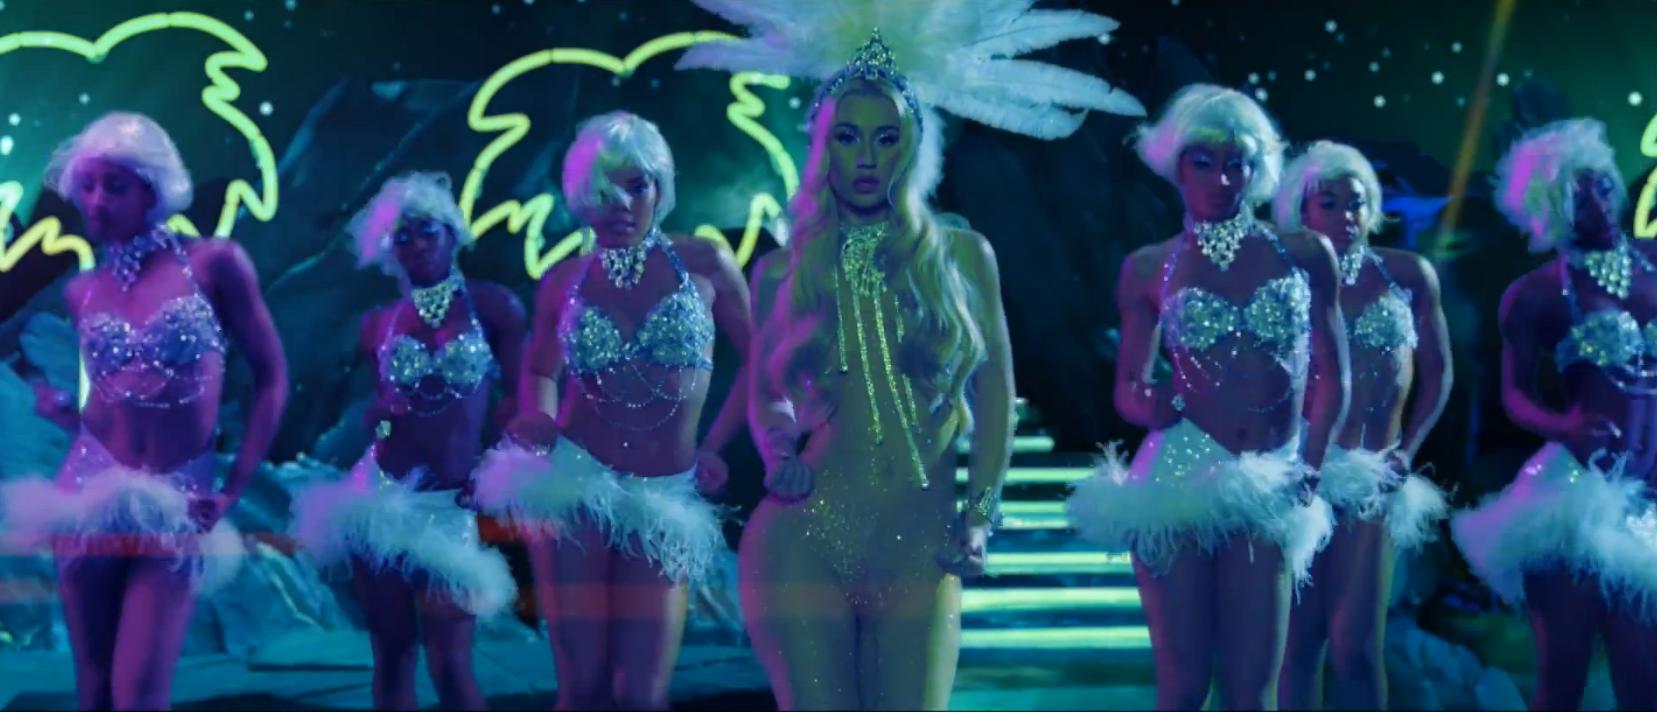 Iggy Azalea Ft Ti Change Your Life Music Video - Hot Girls ...